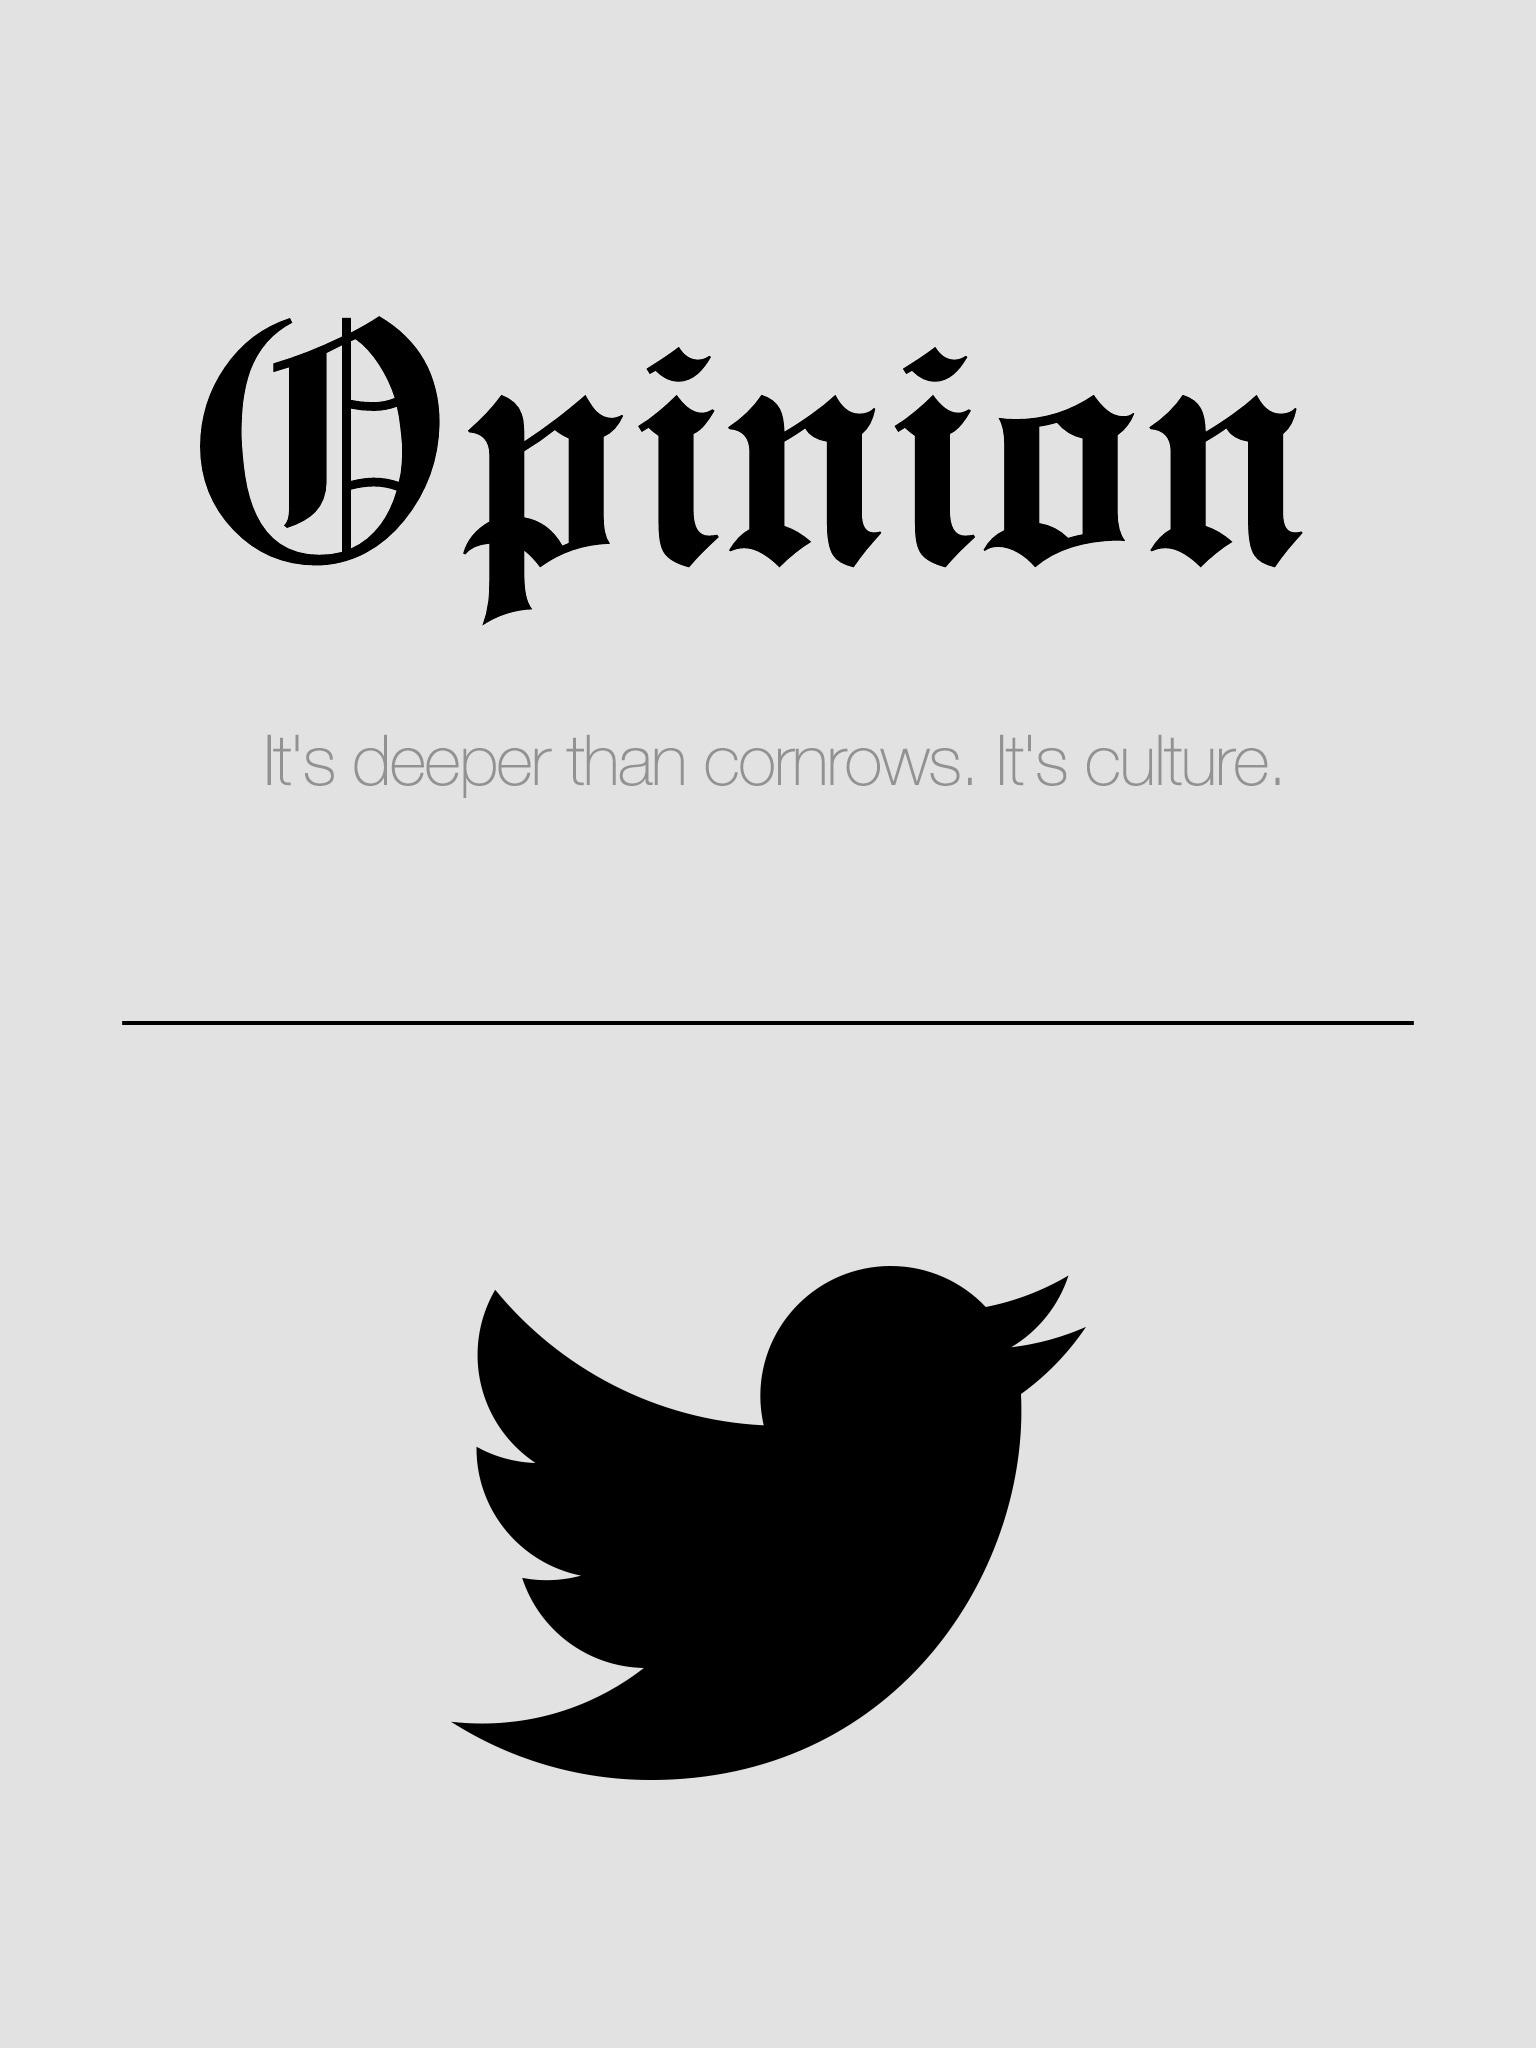 Opinion: It's Deeper Than Cornrows. It's Culture.